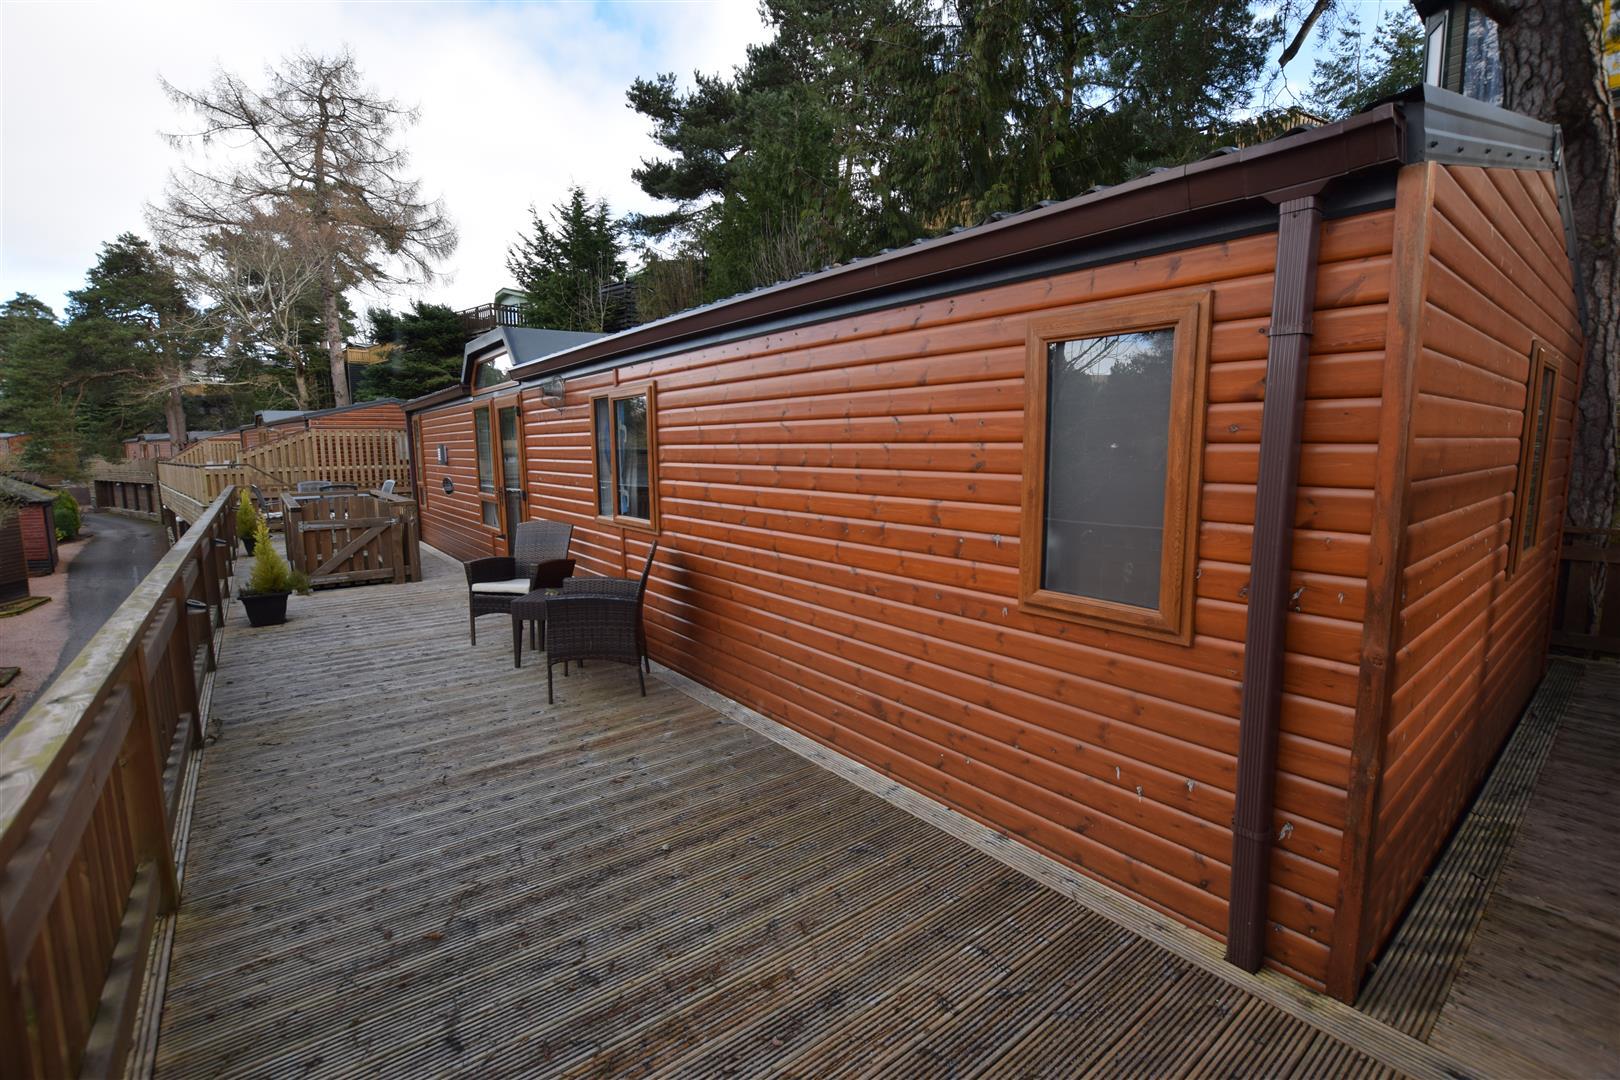 LOasis, Hillside 1, River Tilt Leisure Park, River Tilt Leisure Park, Blair Atholl, Perthshire, PH18 5TE, UK